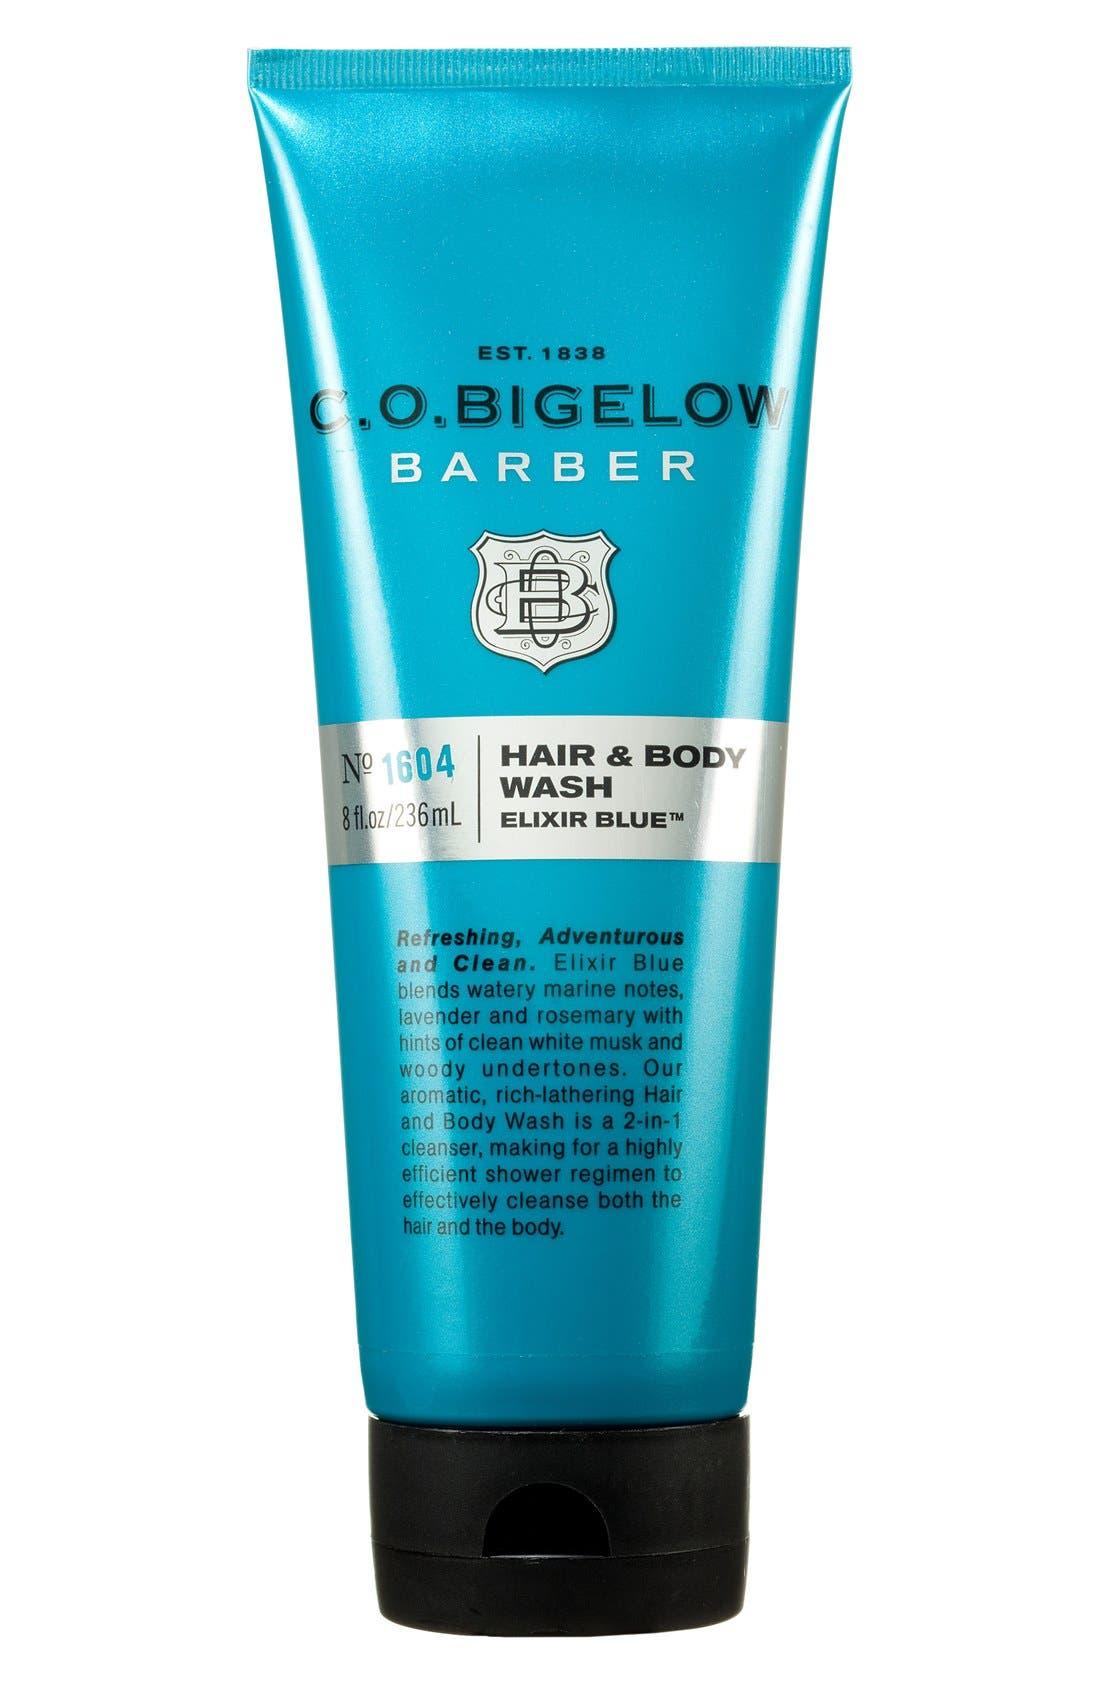 C.O. Bigelow® 'Barber - Elixir Blue' Hair & Body Wash